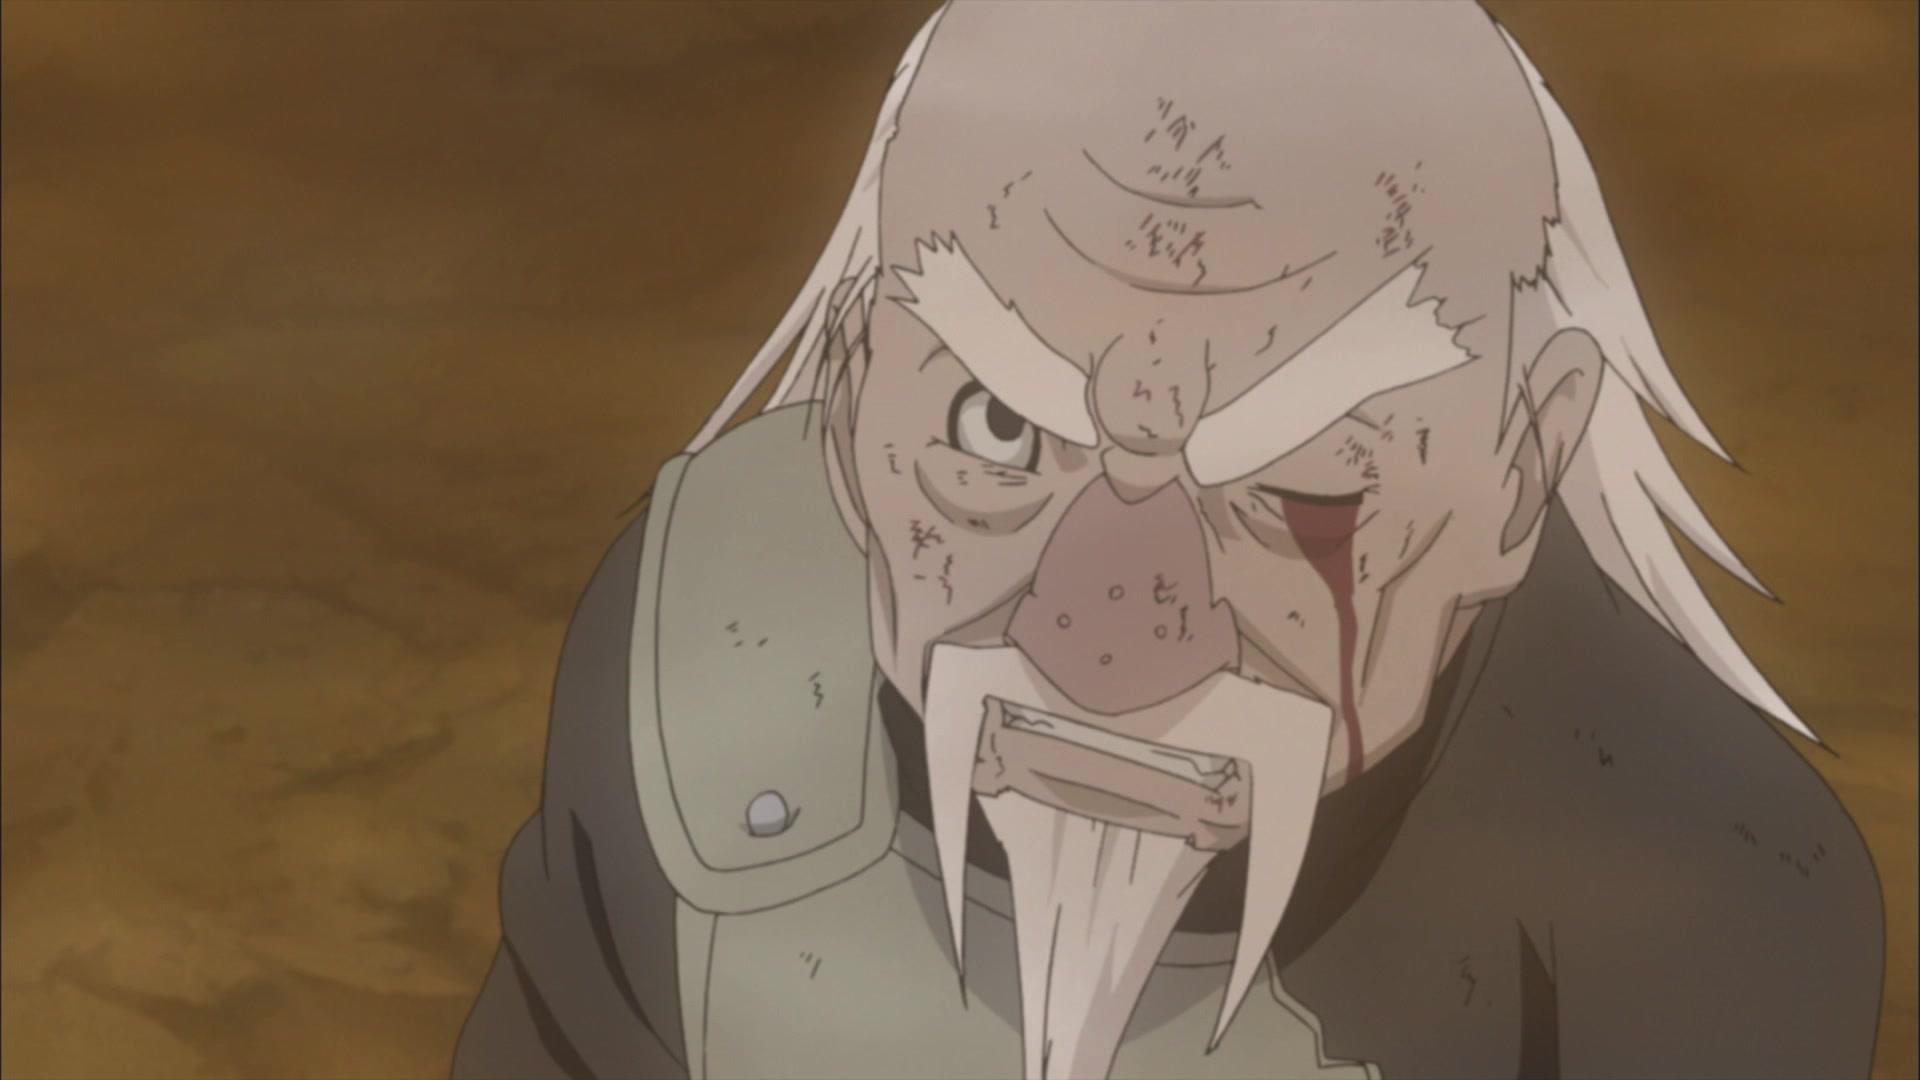 Naruto Shippuden: The Fourth Great Ninja War - Sasuke and